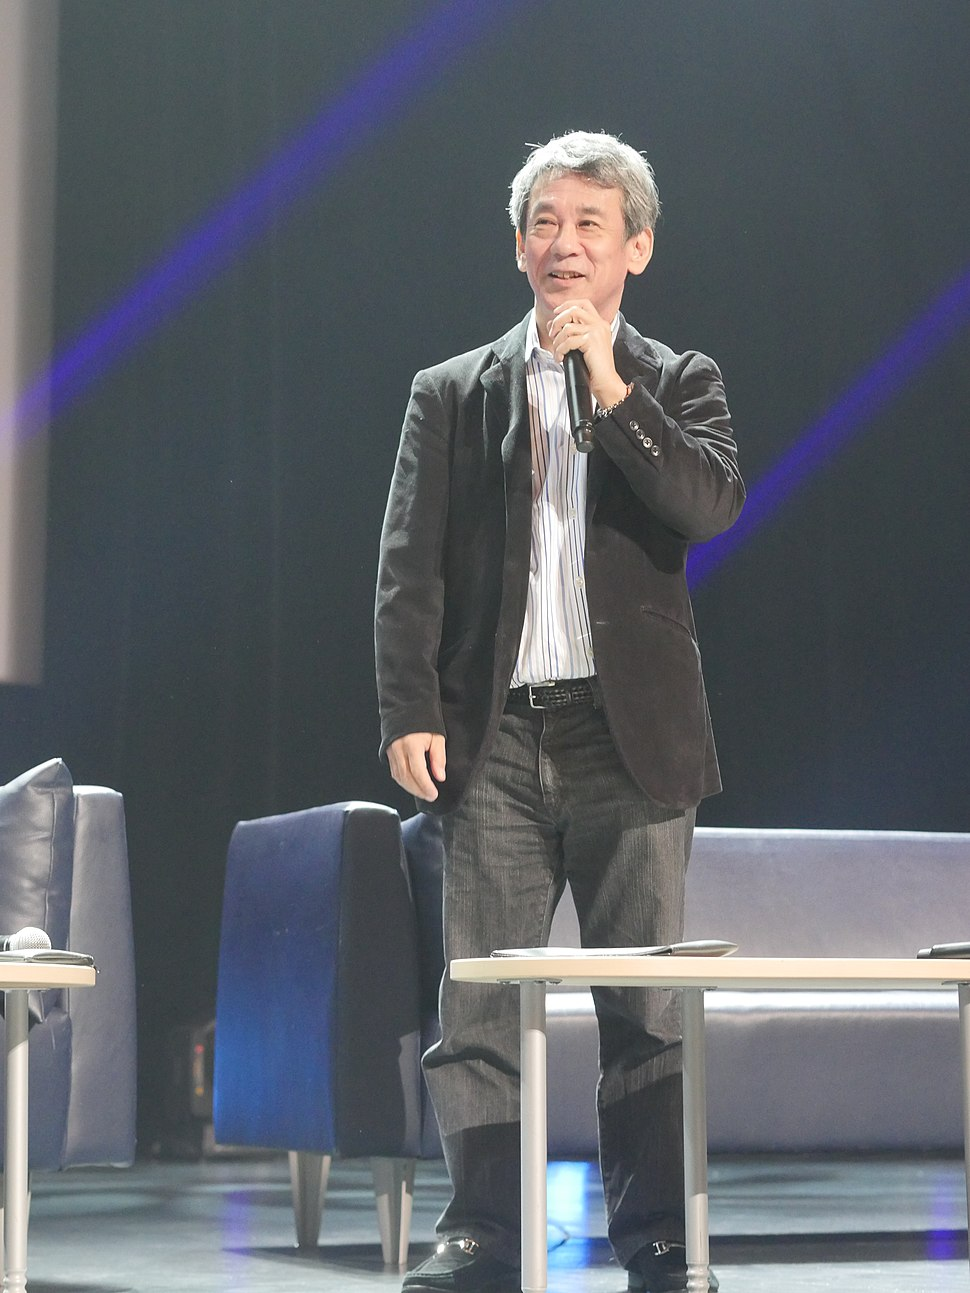 Conférence Shinji Hashimoto - Magic - Monaco - 2015-03-21- P1030017